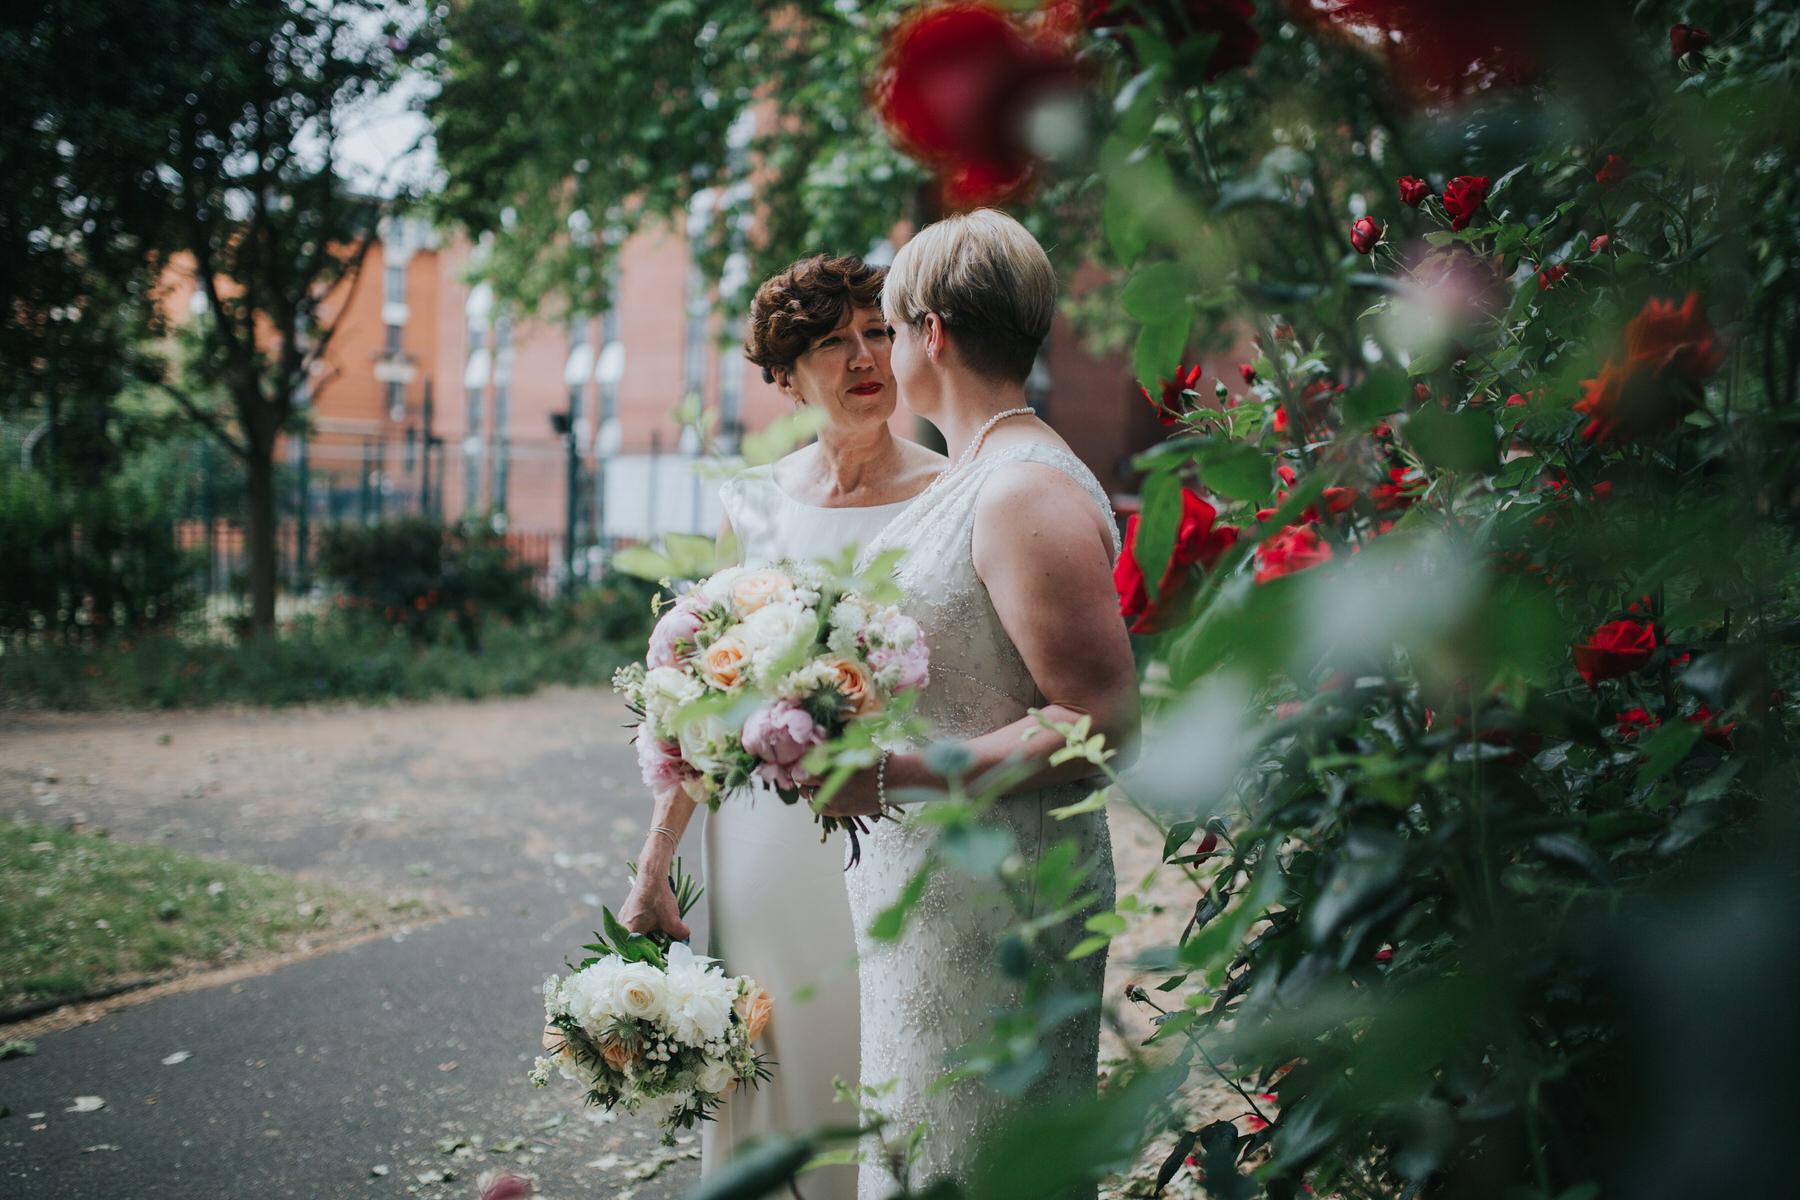 180 London wedding photojournalist two brides couple portraits.jpg